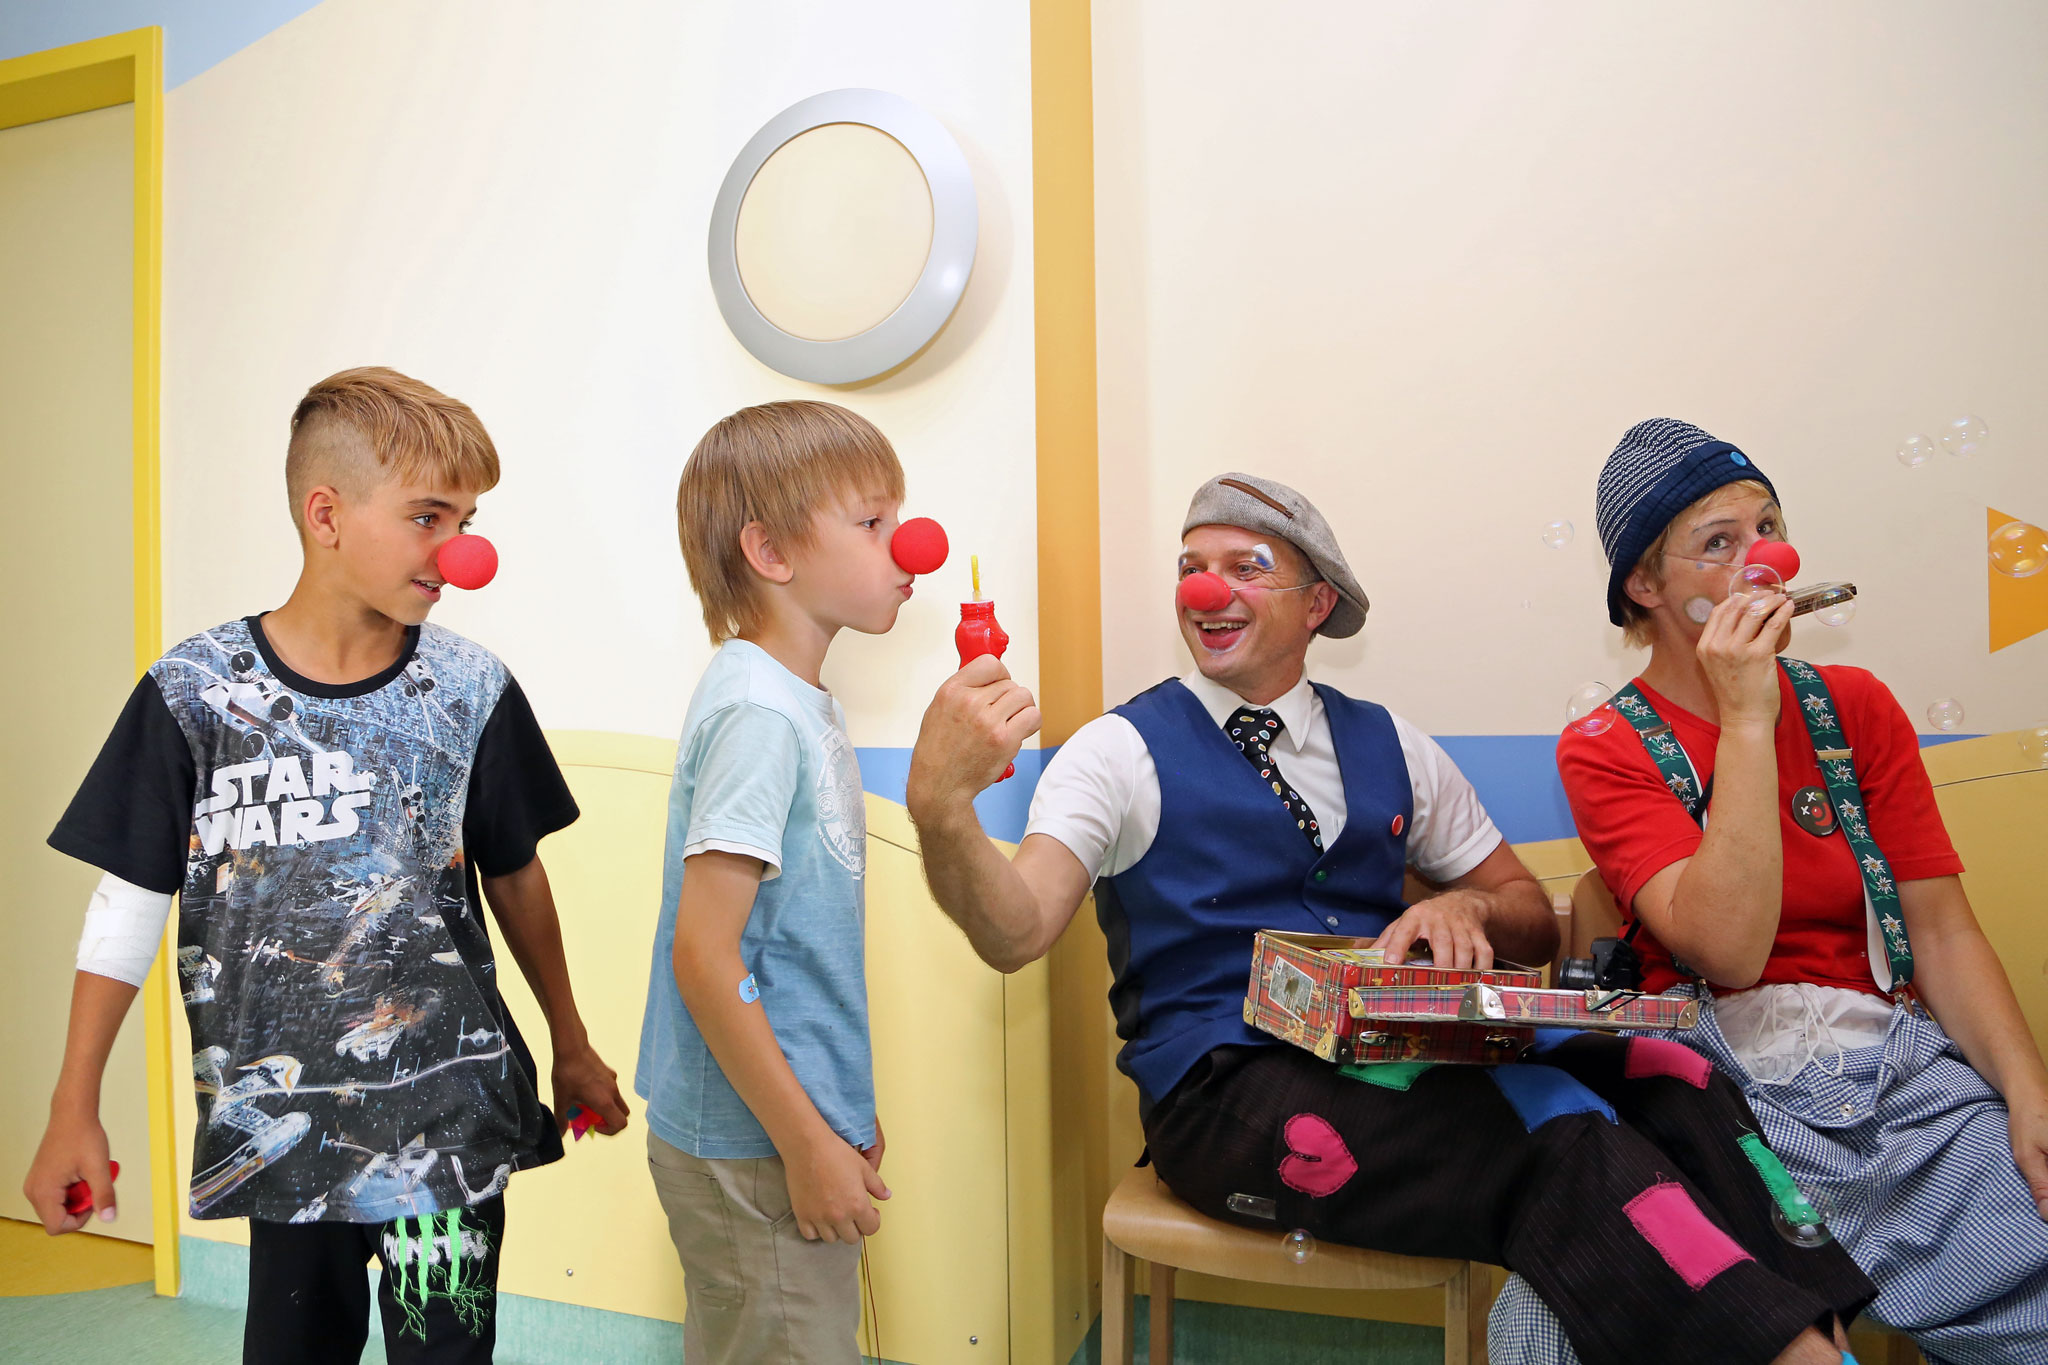 klinikclowns-moenchberg-kinderklinik-09122015-01